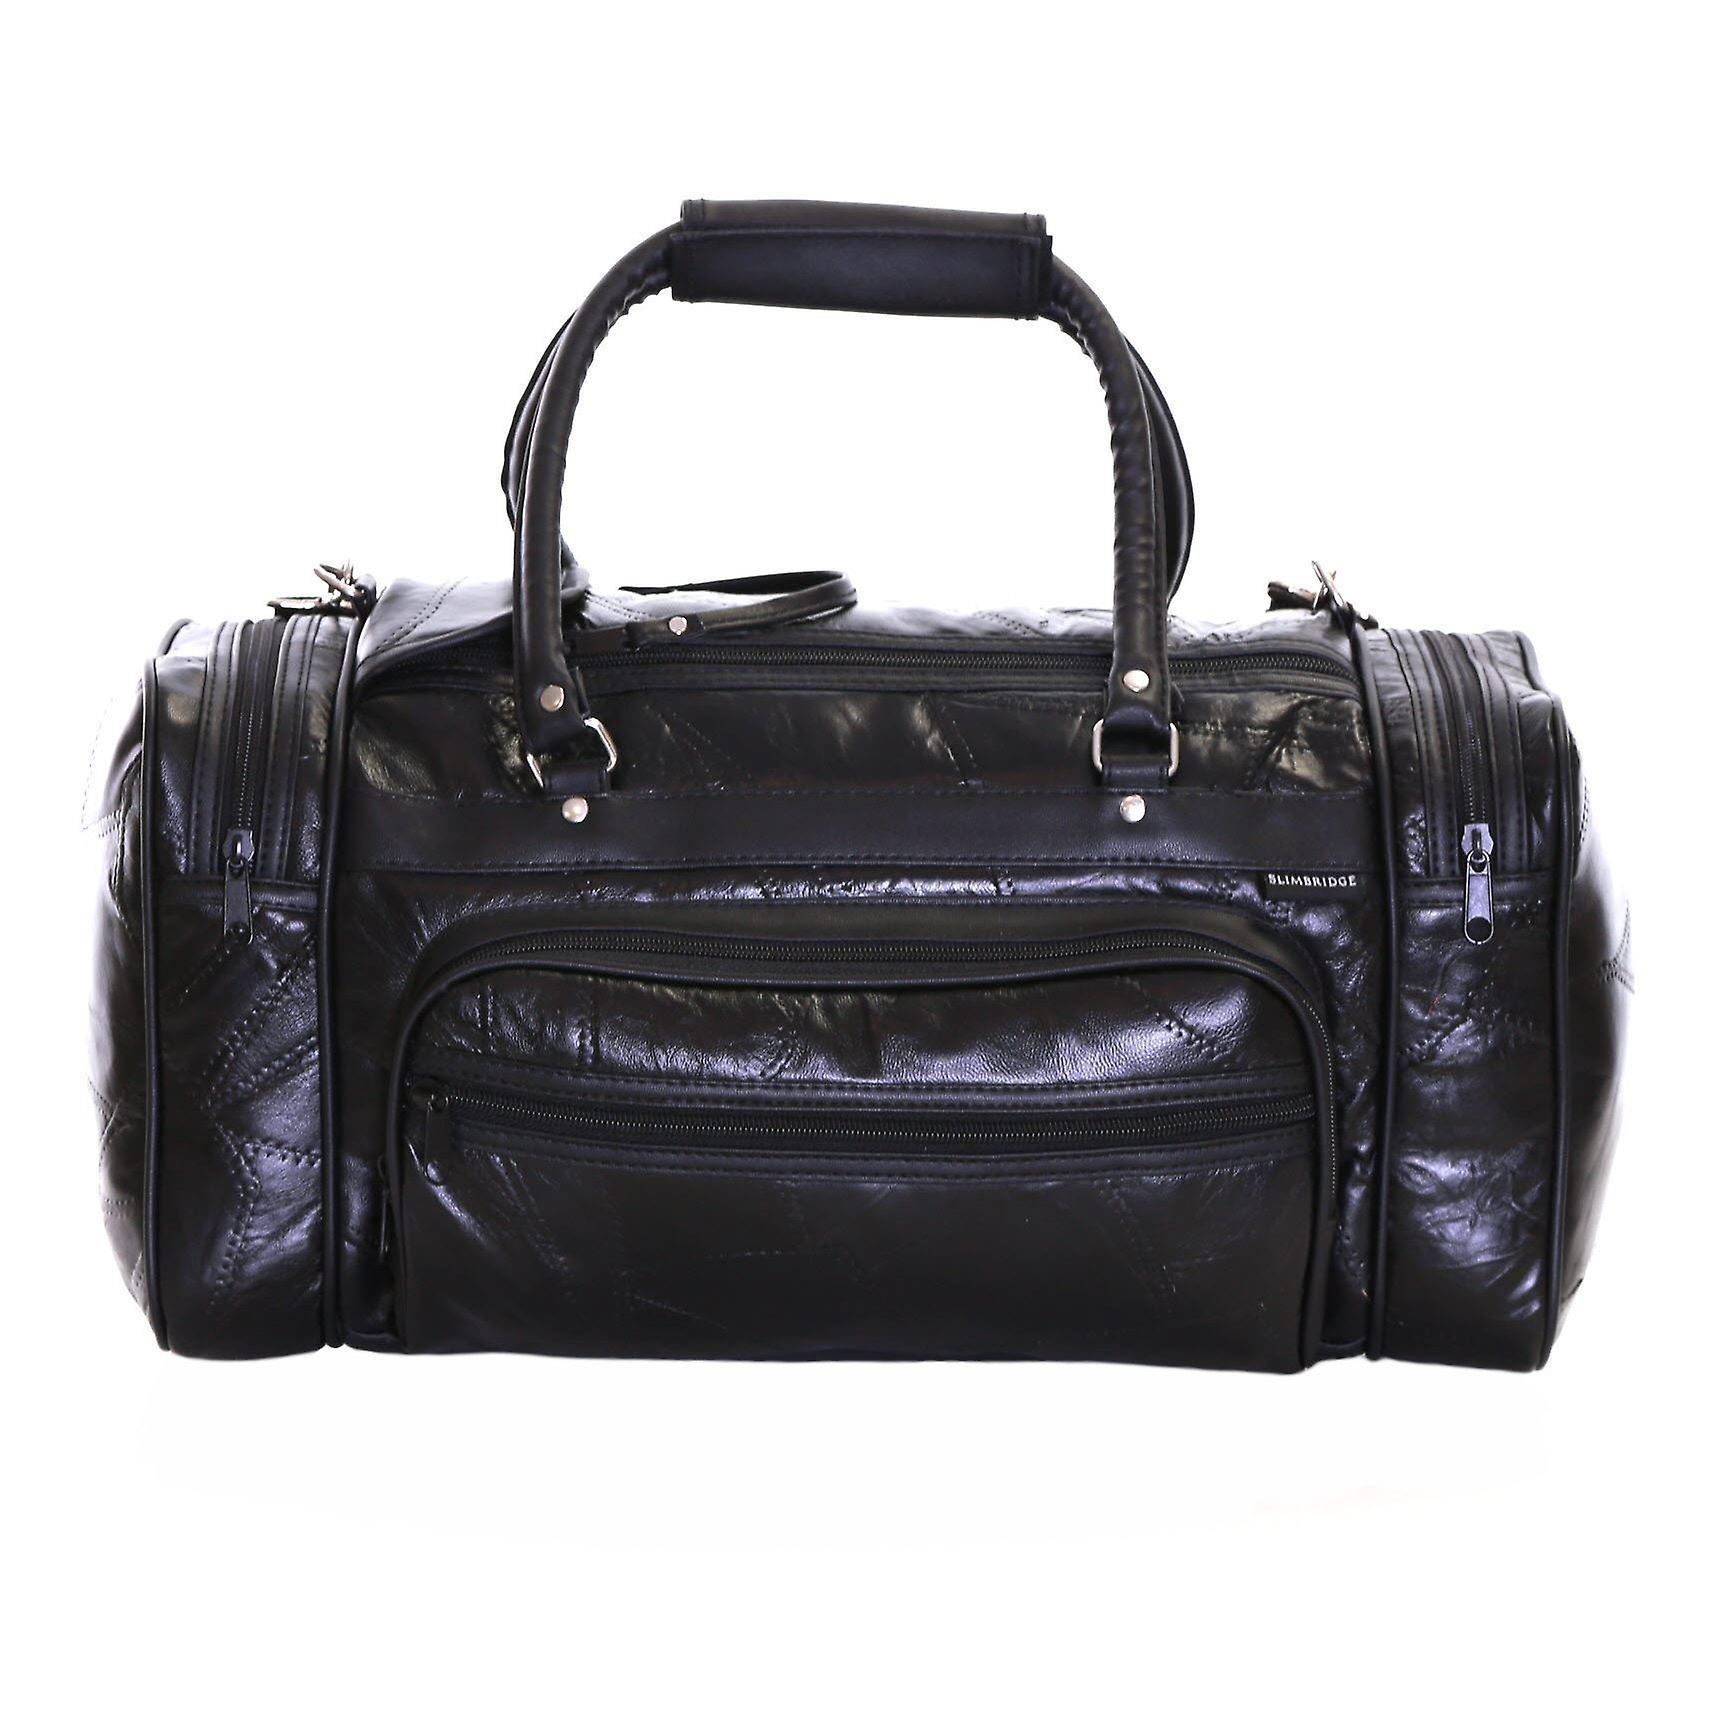 Slimbridge Blumberg Leather Travel Bag, Black